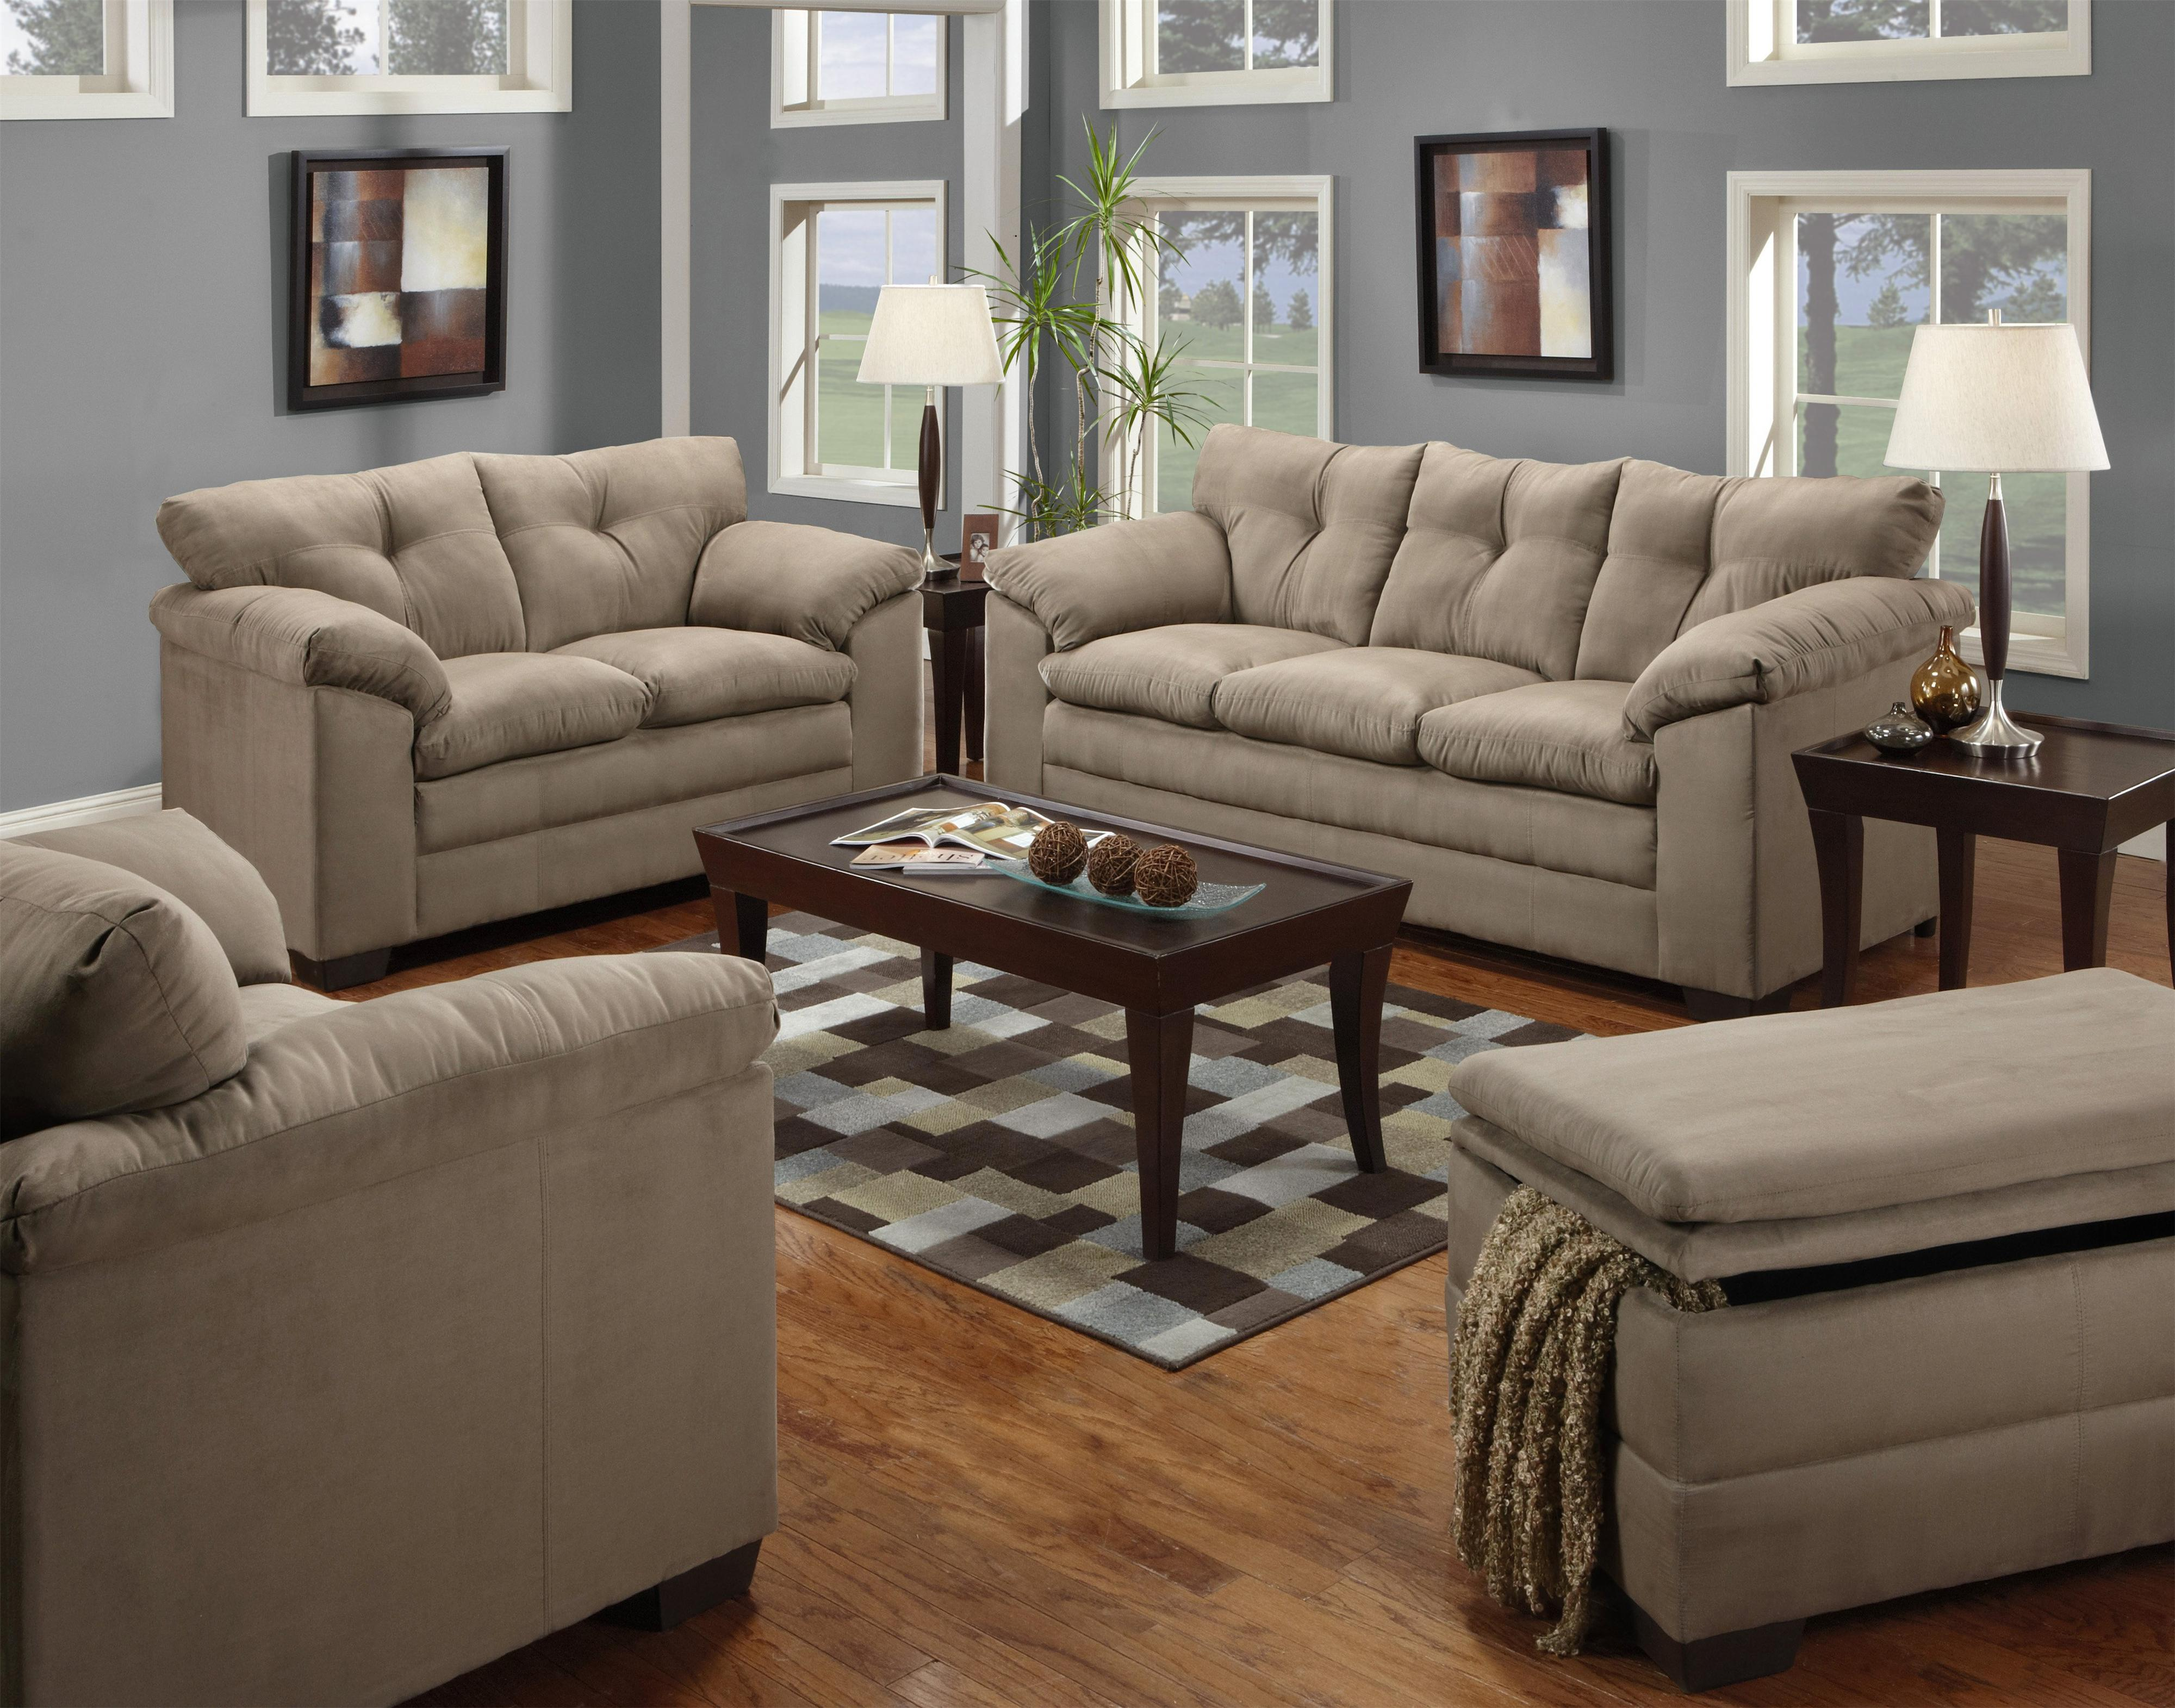 United Furniture Industries 6565 Stationary Living Room